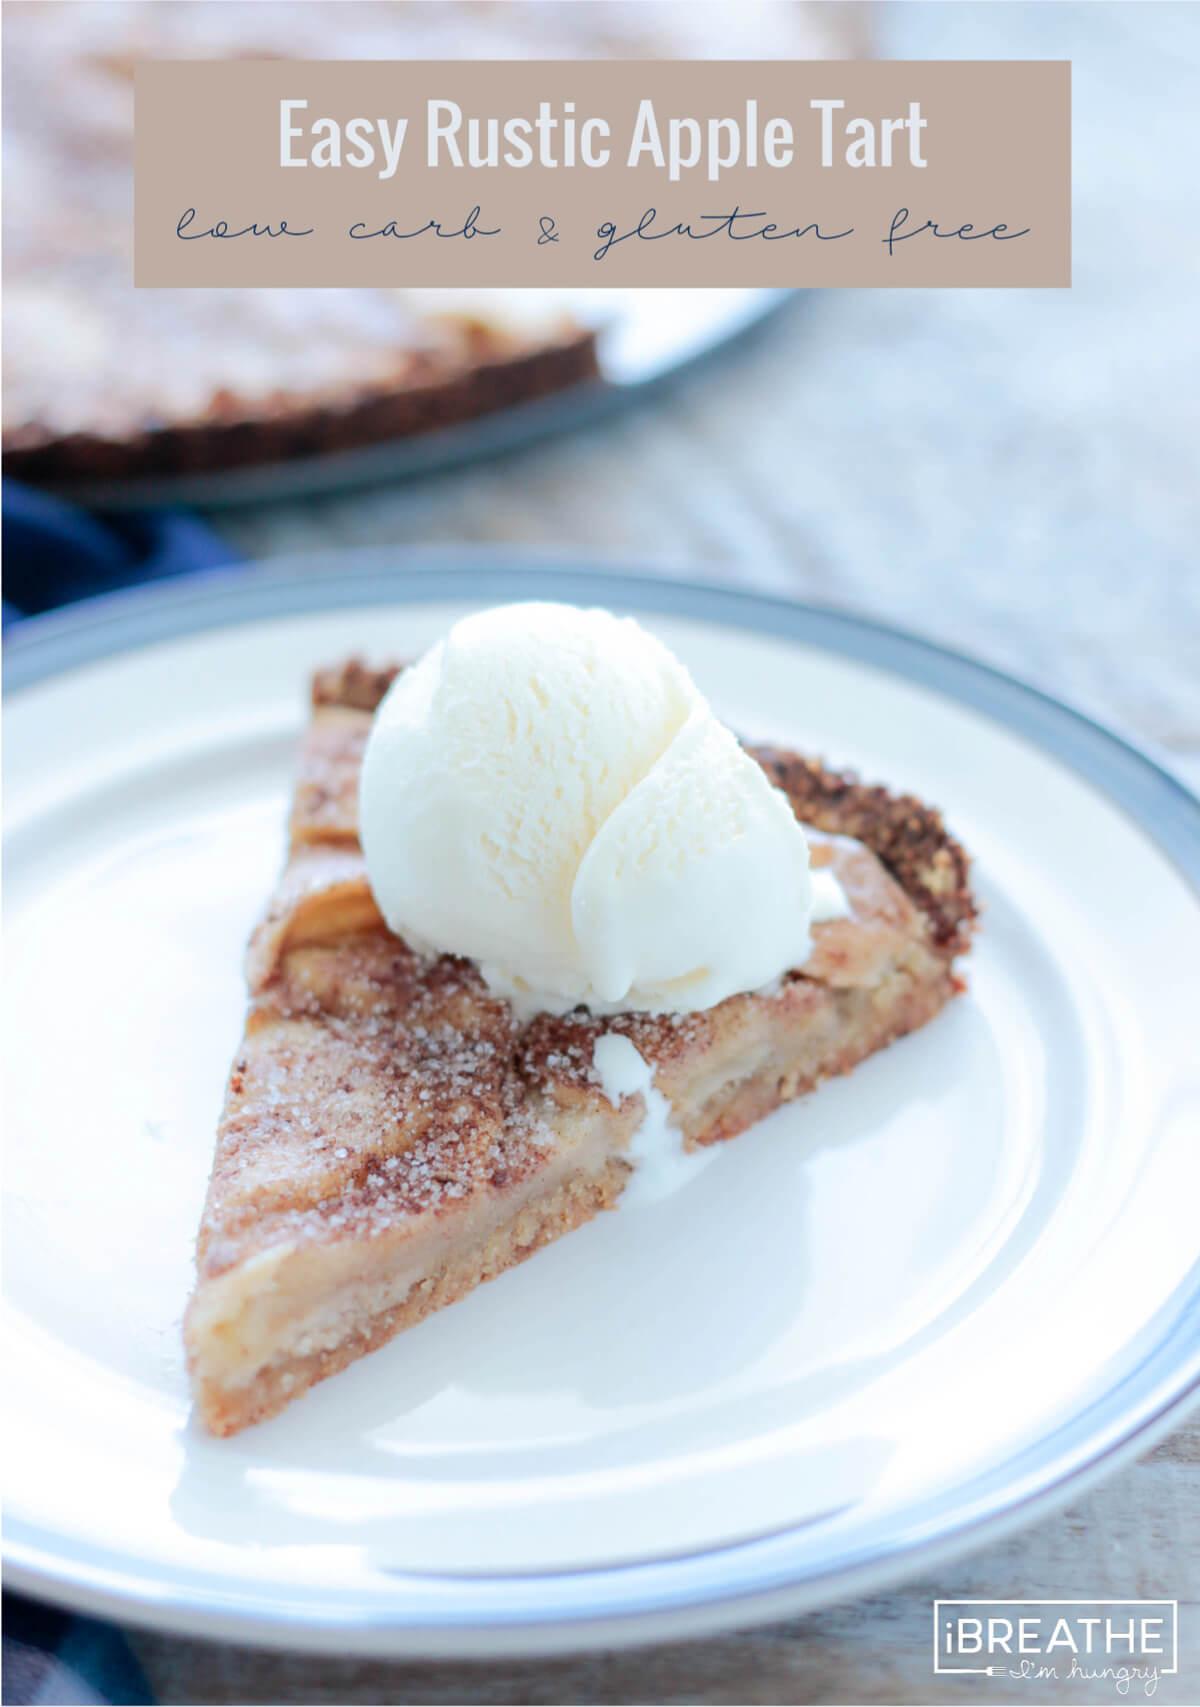 Keto Apple Tart serving suggestion - add vanilla ice cream!